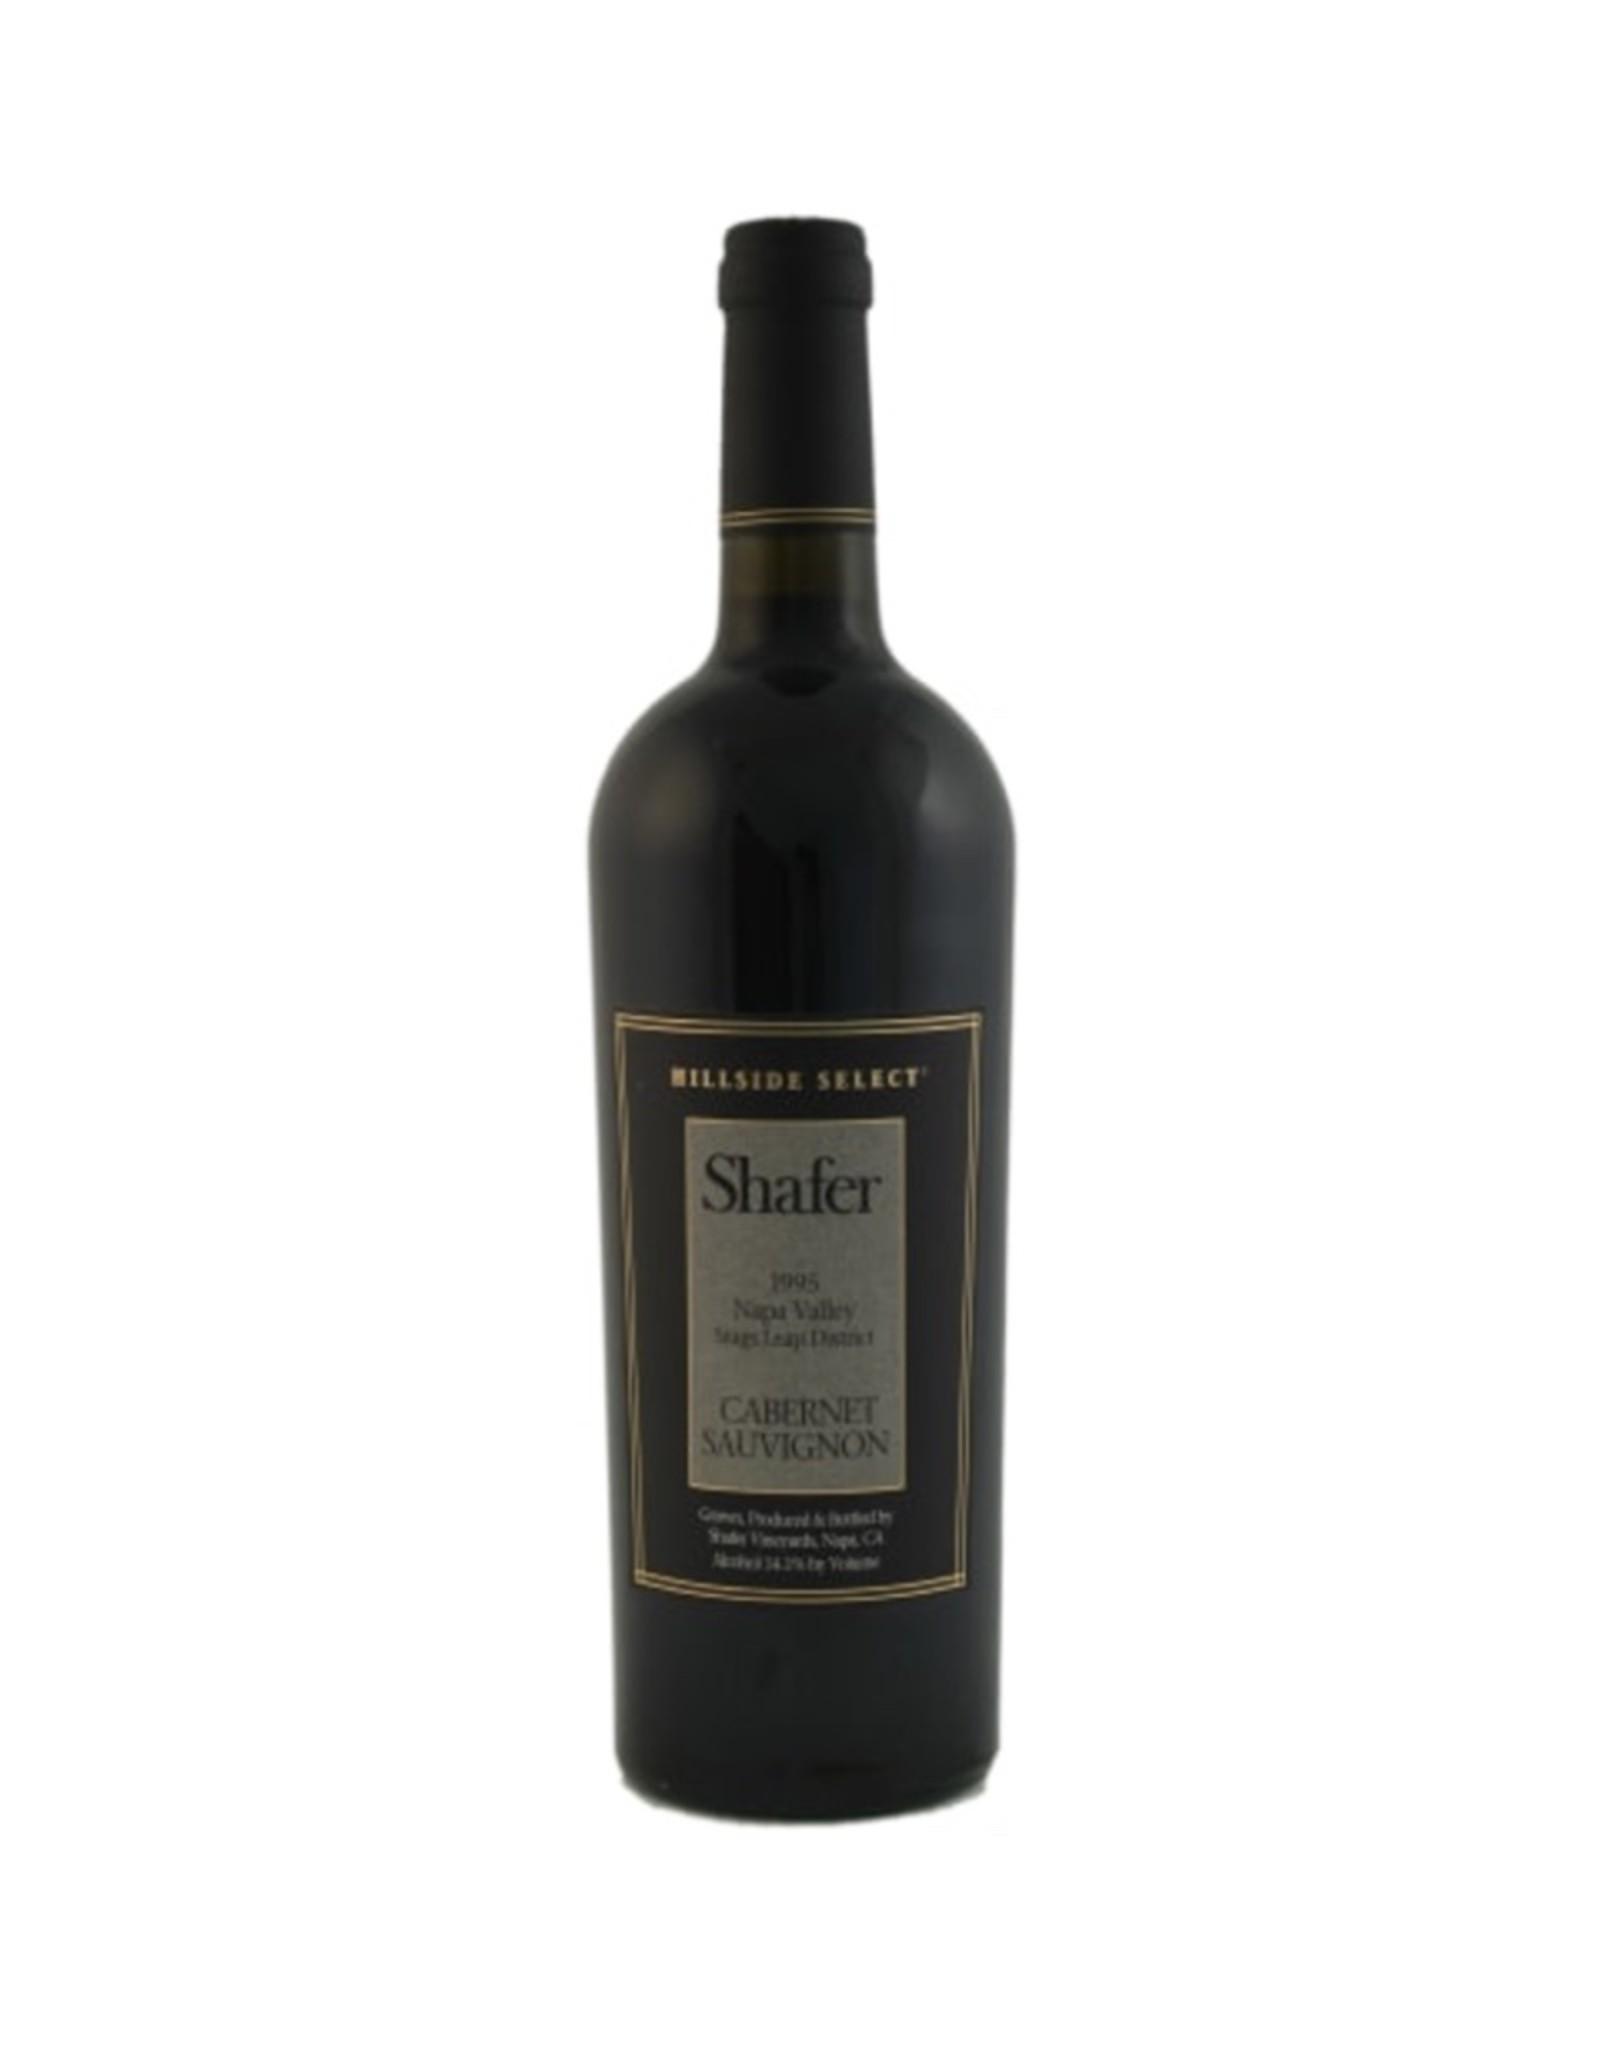 Shafer Hillside Select Cabernet Napa Valley 2015